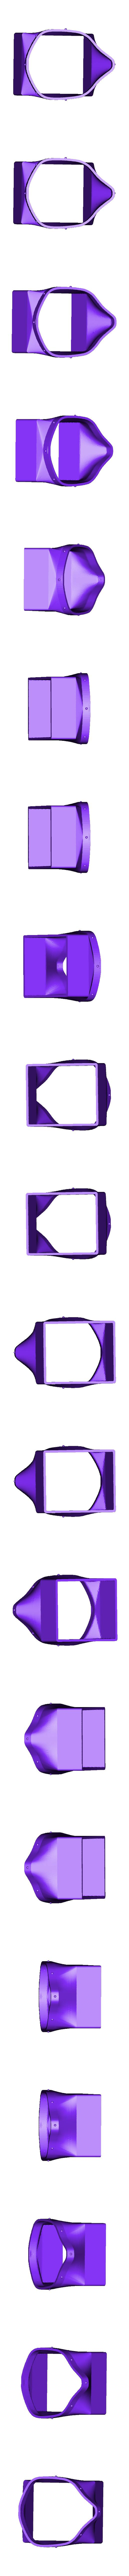 BolivAIR_Filter_Tray_Roomba_v4.stl Download free STL file BolivAIR Mask Tray - Roomba Filter • 3D printing design, bLiTzJoN